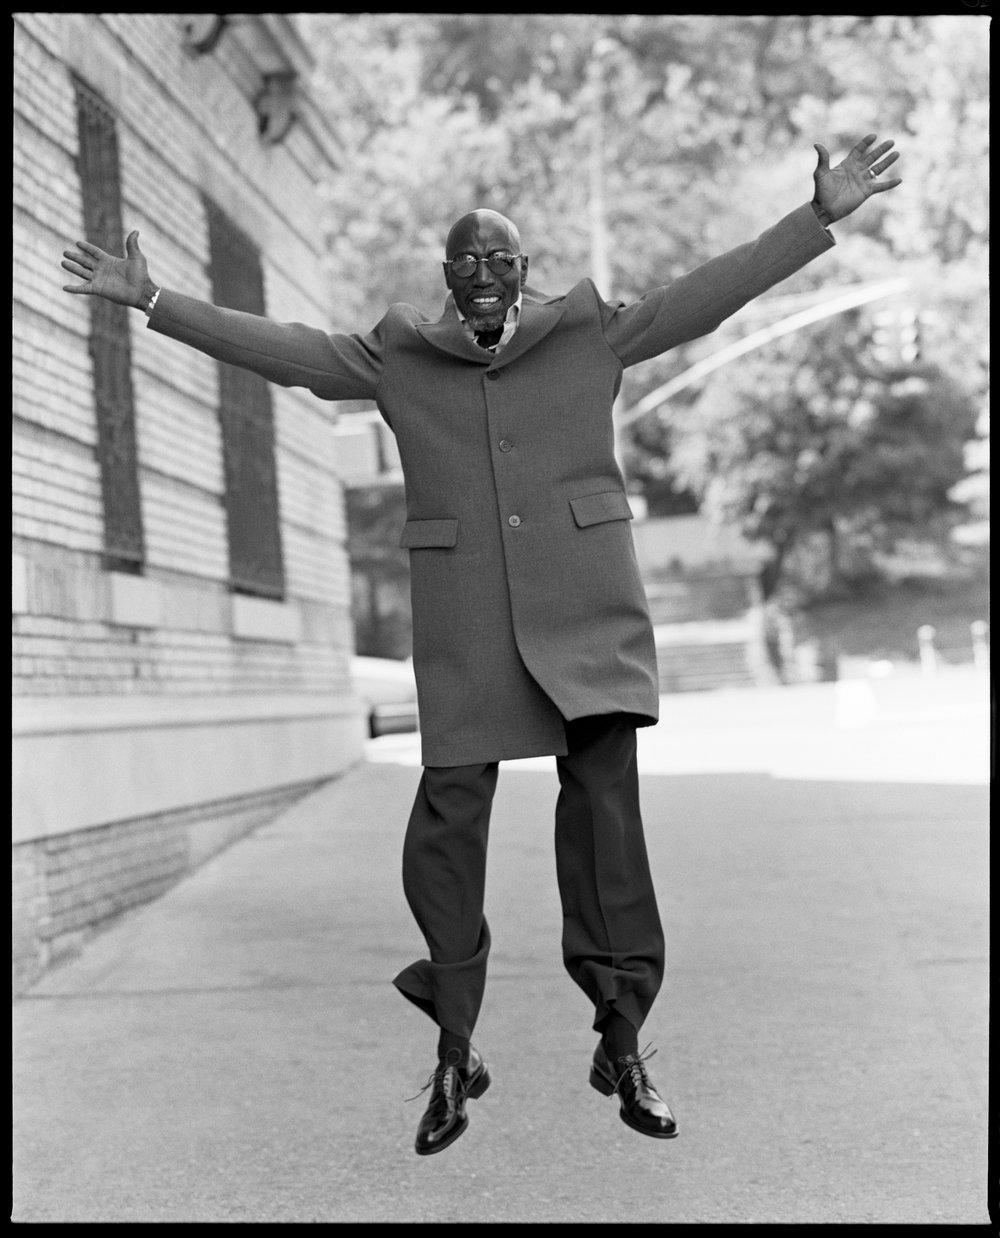 Thelonius Monk, J.R., 1998, New York City © Arthur Elgort